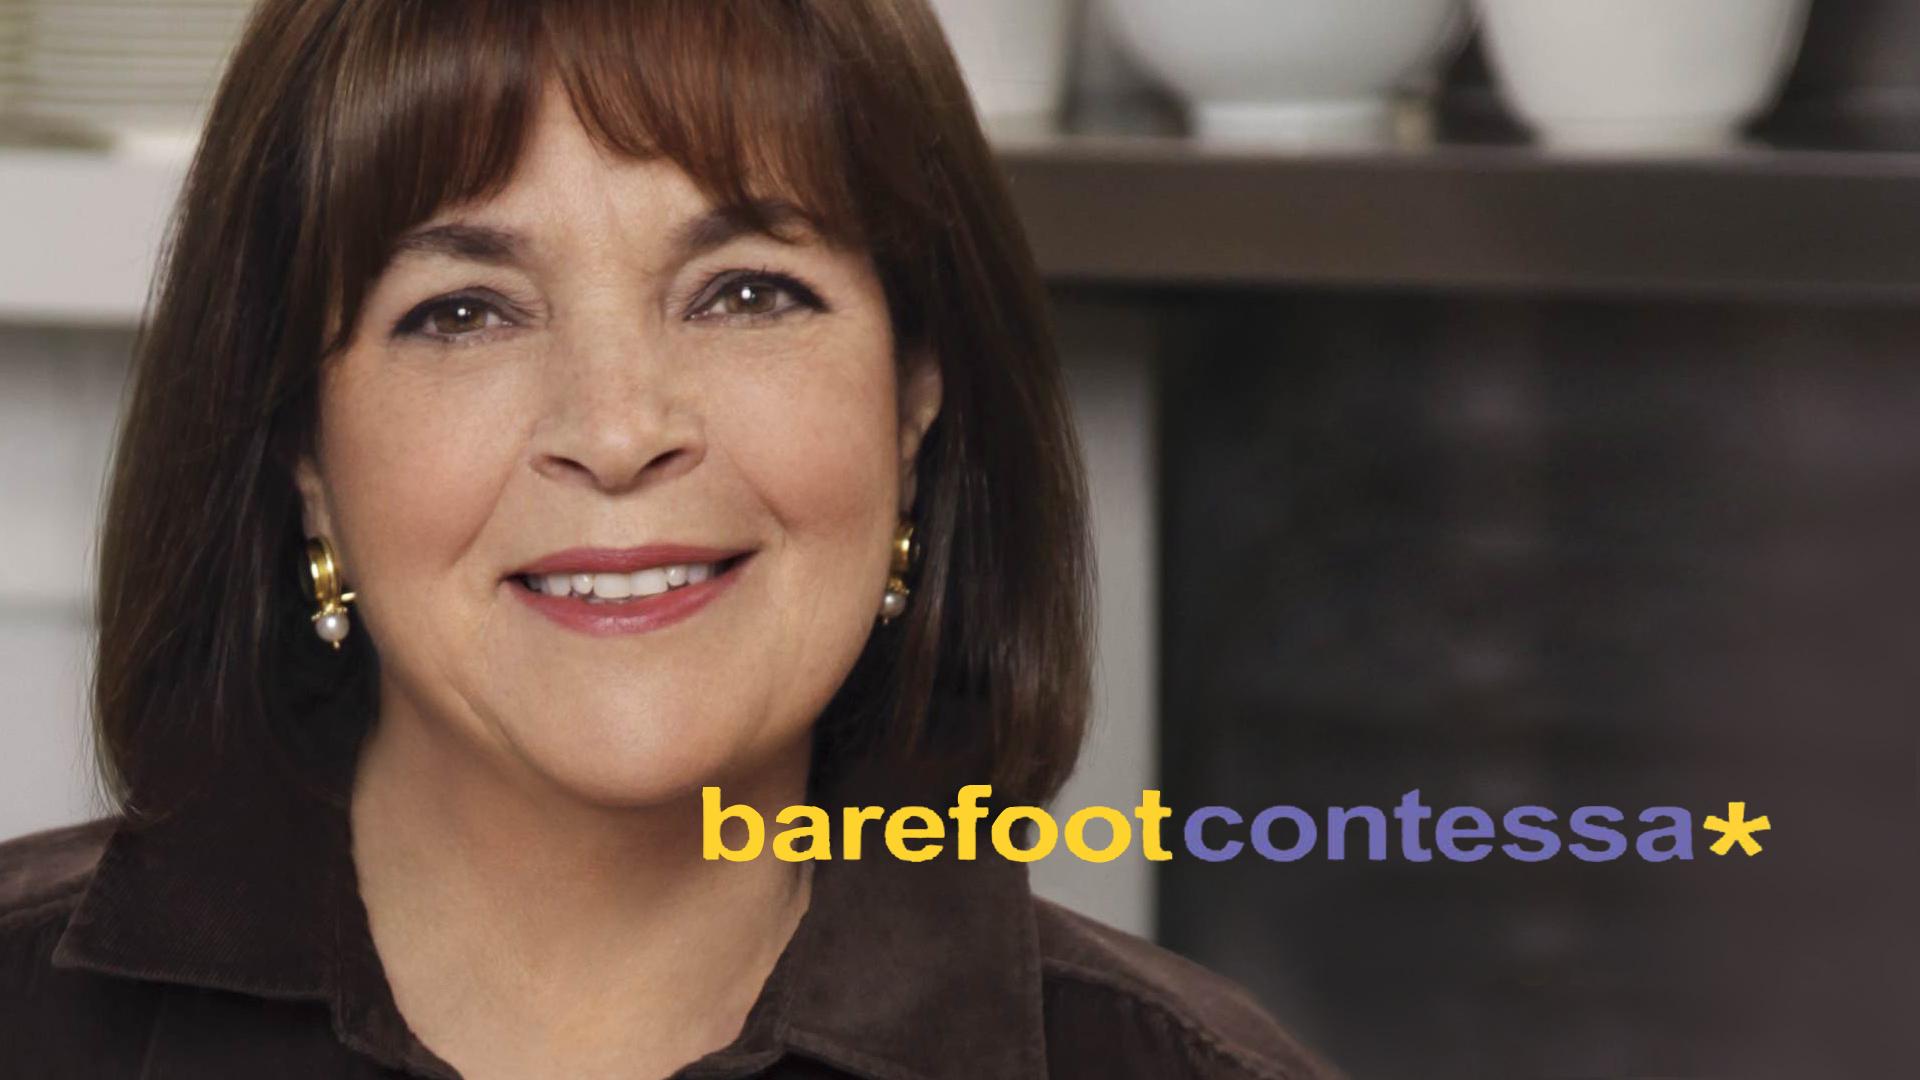 Barefoot Contessa Specials Volume 1